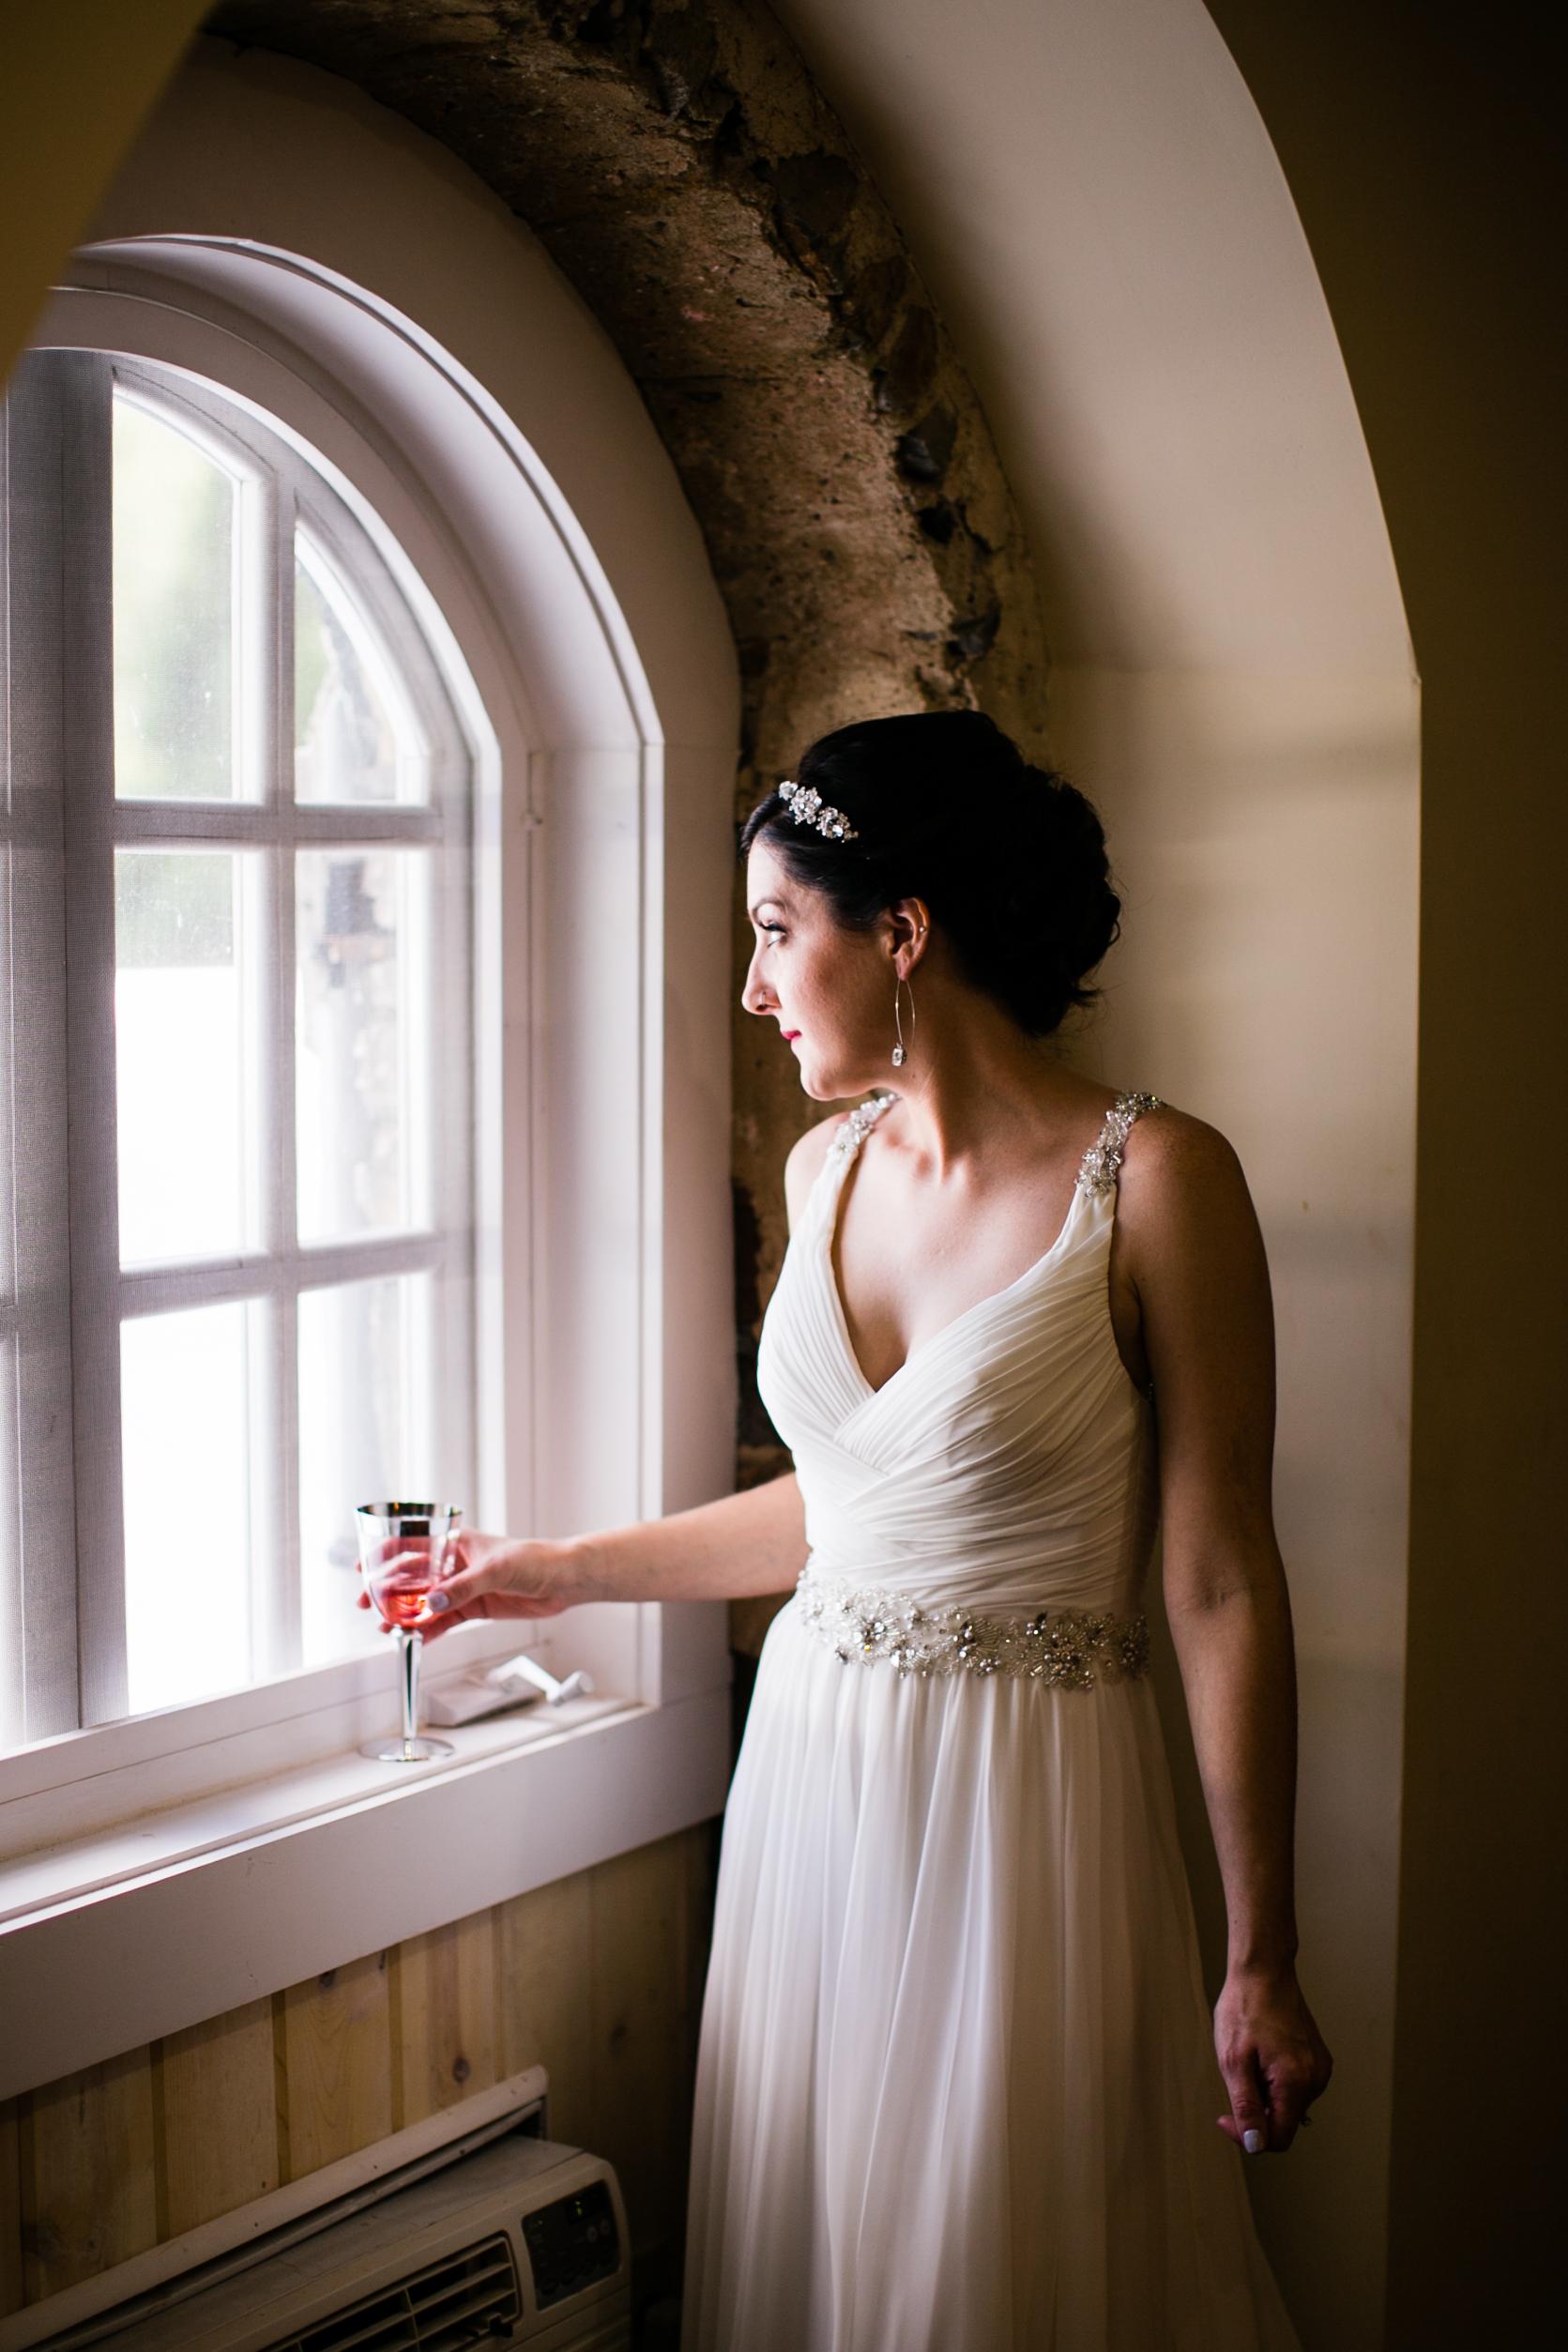 TYLER ARBORETUM WEDDING PHOTOGRAPHY LOVESTRUCK PICTURES-011.jpg